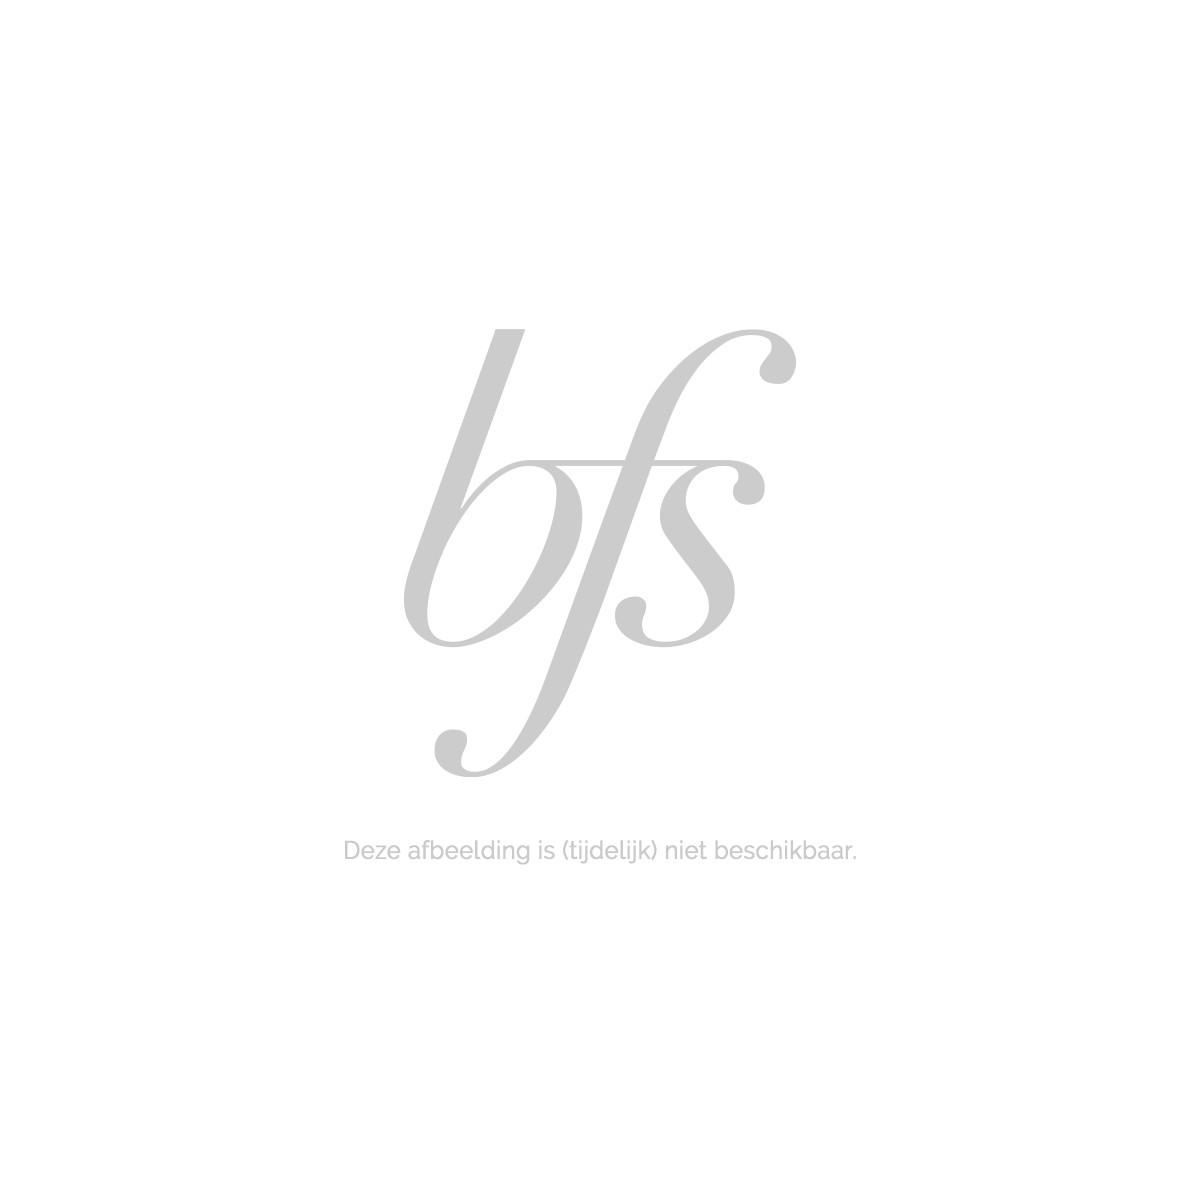 Orly Bonder Basecoat Transparant